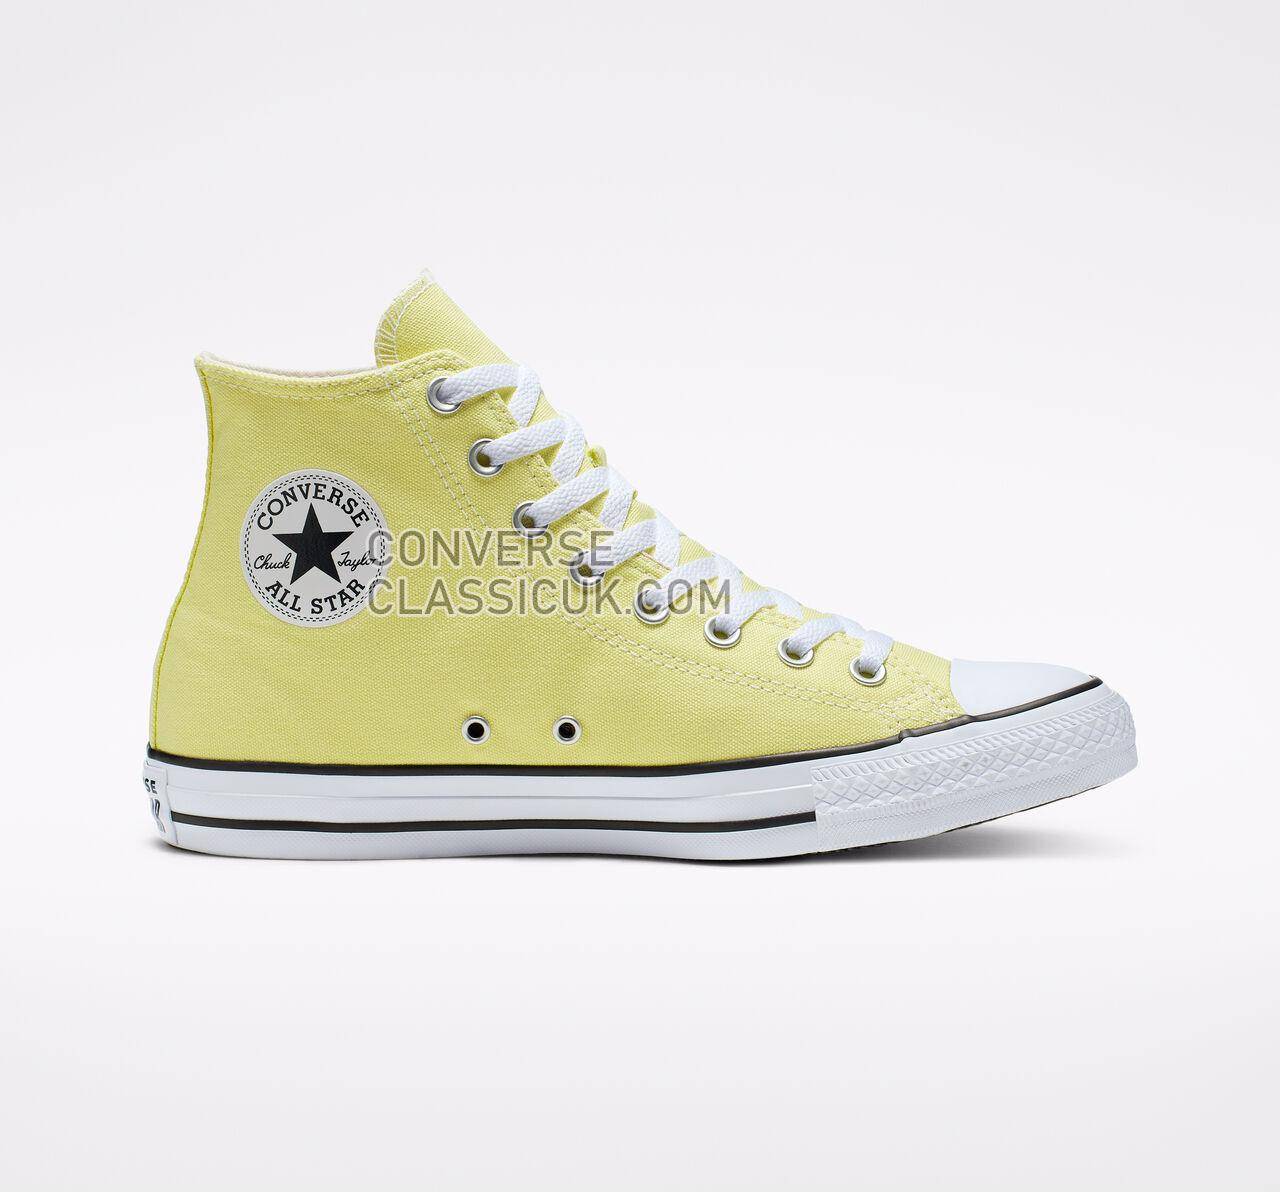 Converse Chuck Taylor All Star Seasonal Color High Top Mens Womens Unisex 165497F Lt Zitron/White/Black Shoes